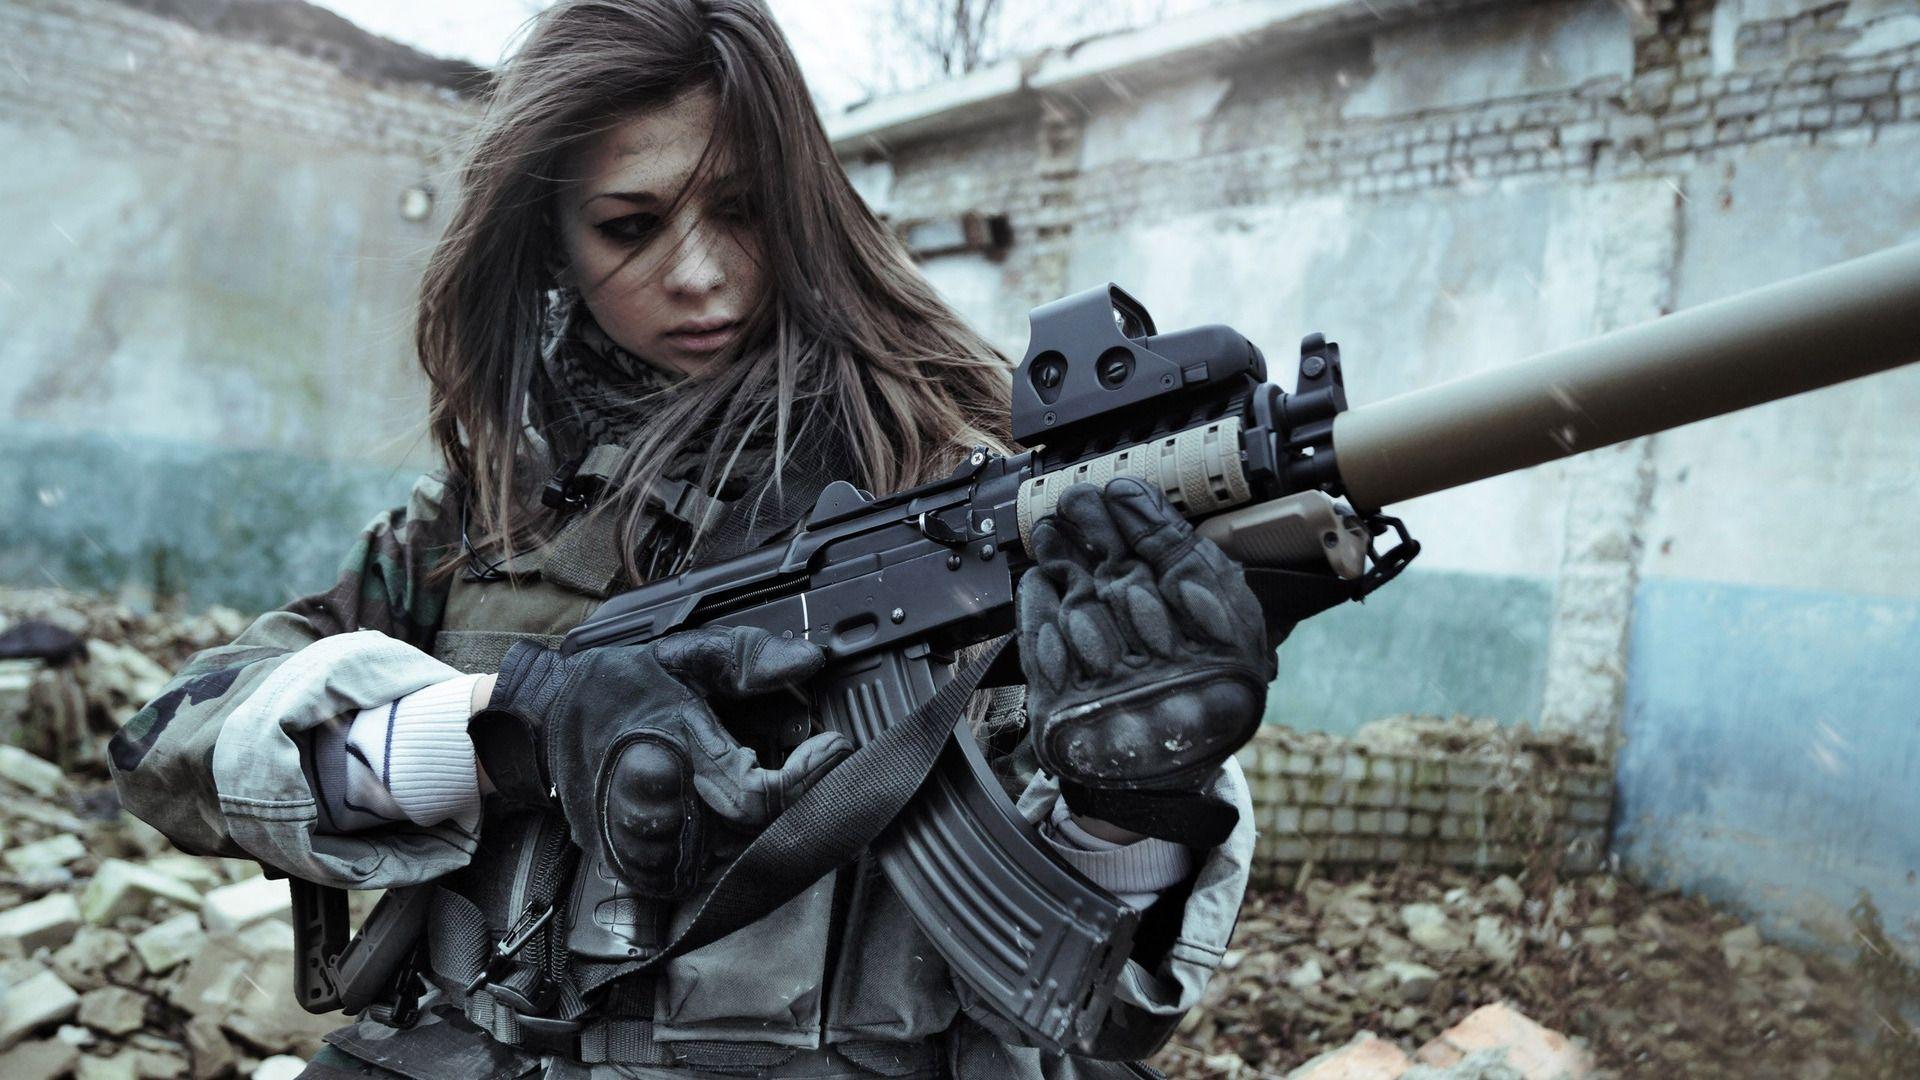 Woman Soldier wallpaper in 2019 Girl guns Guns Female soldier 1920x1080